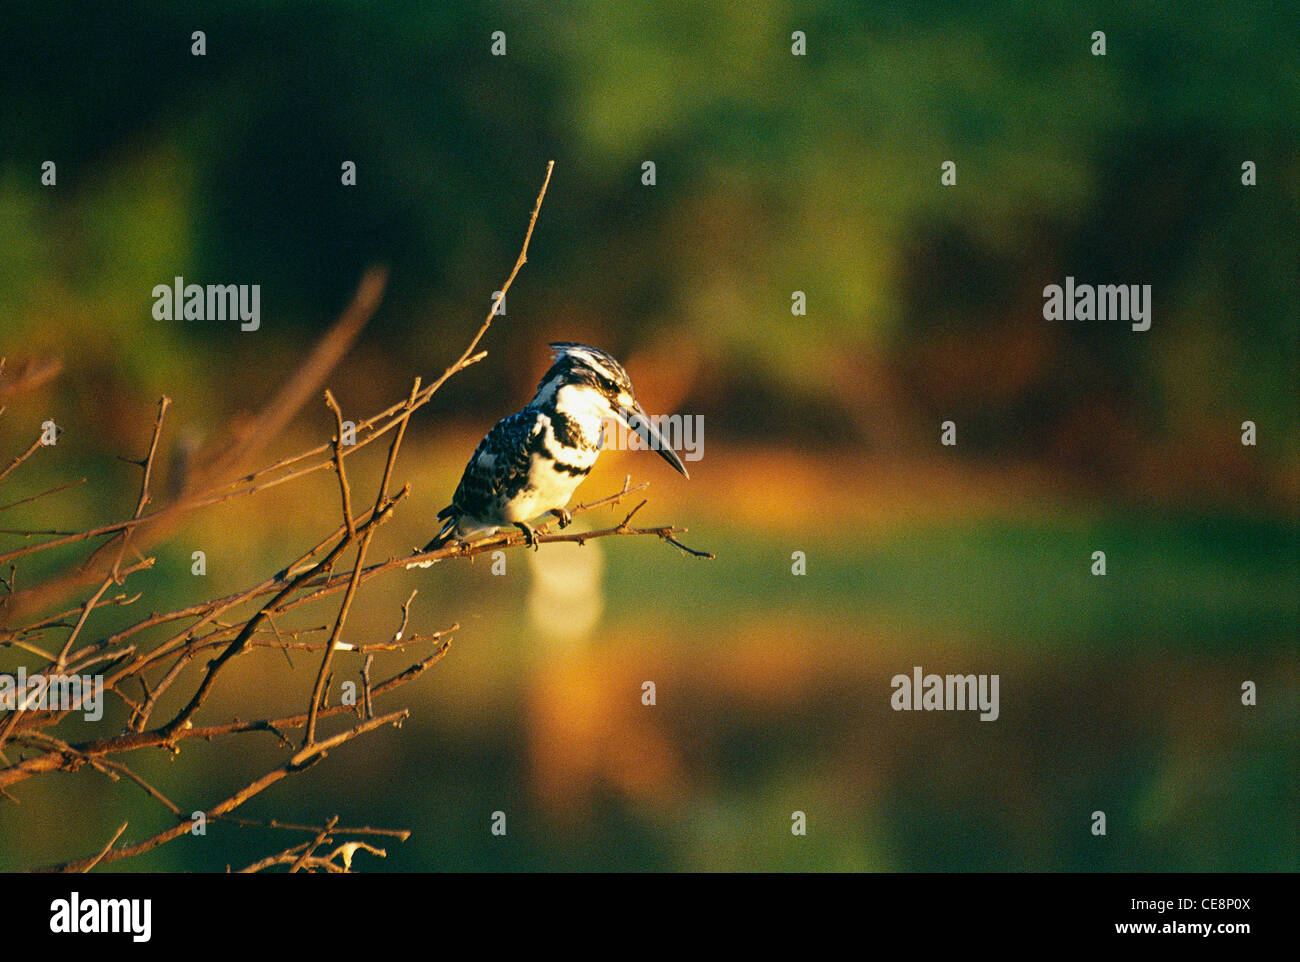 UGA 80135 : Bird Pied Kingfisher ceryle Rudis , Bharatpur , Rajasthan , india - Stock Image